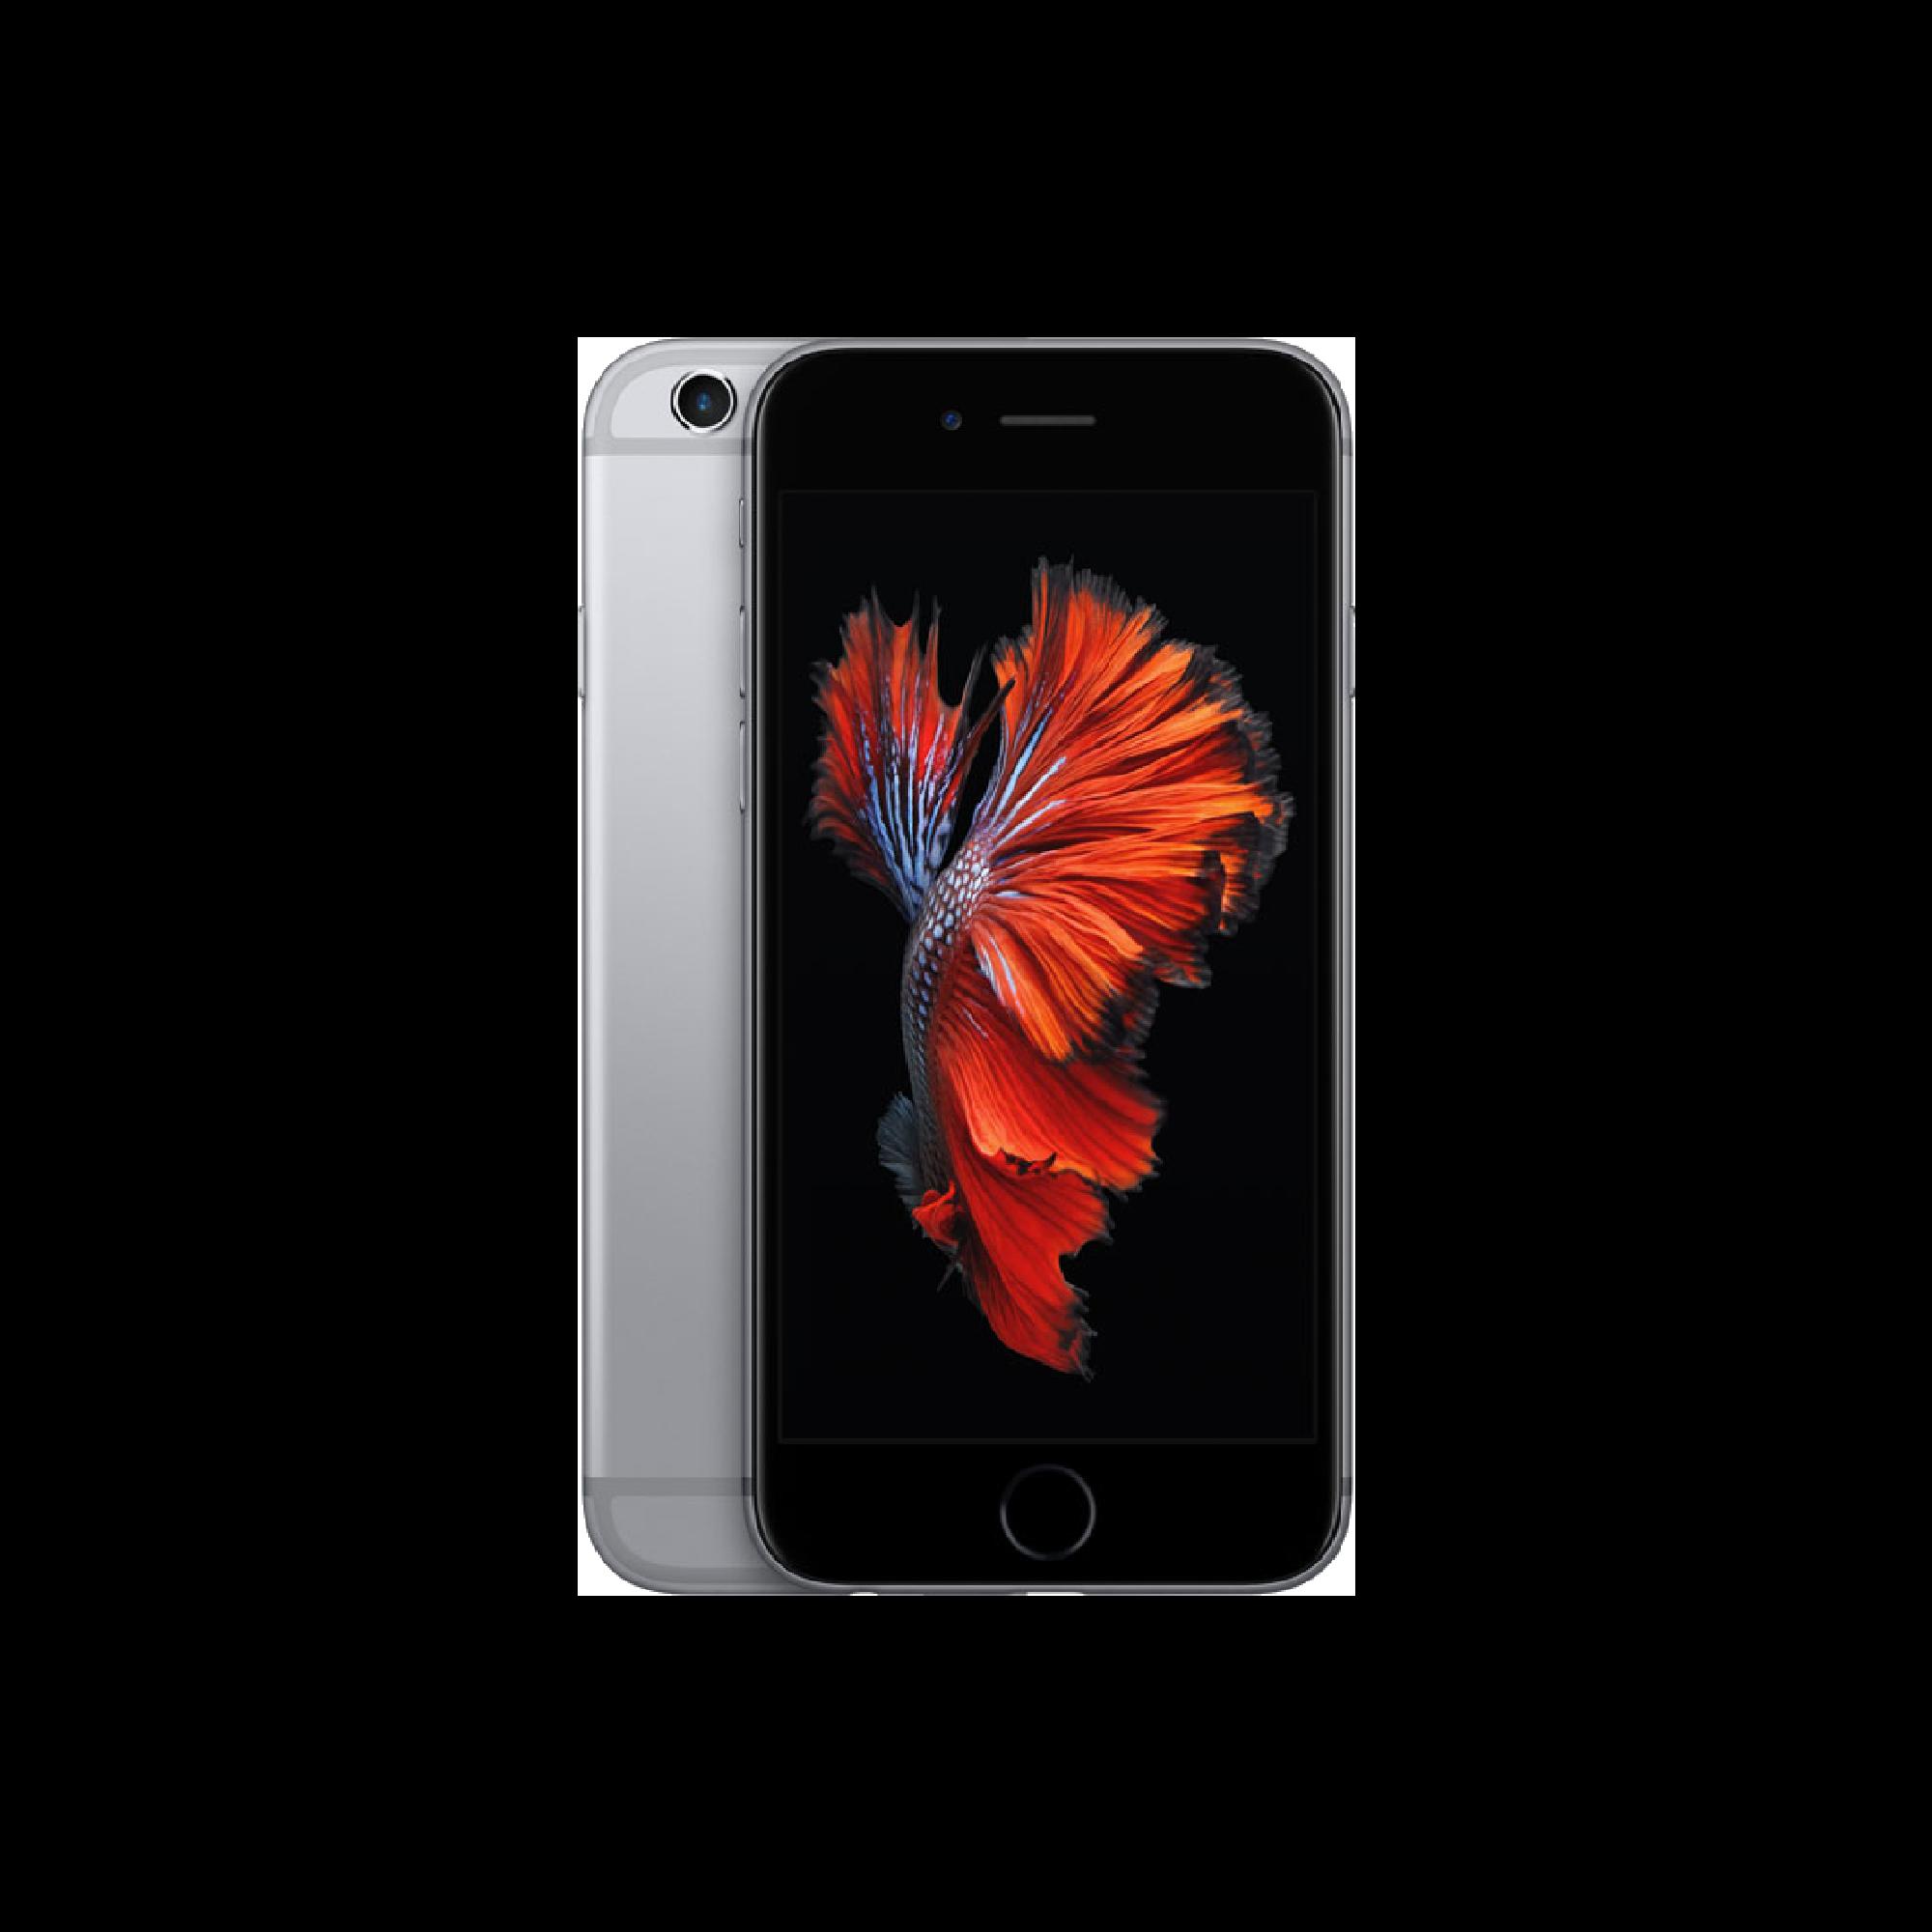 iPhone 6S | $95 + tax